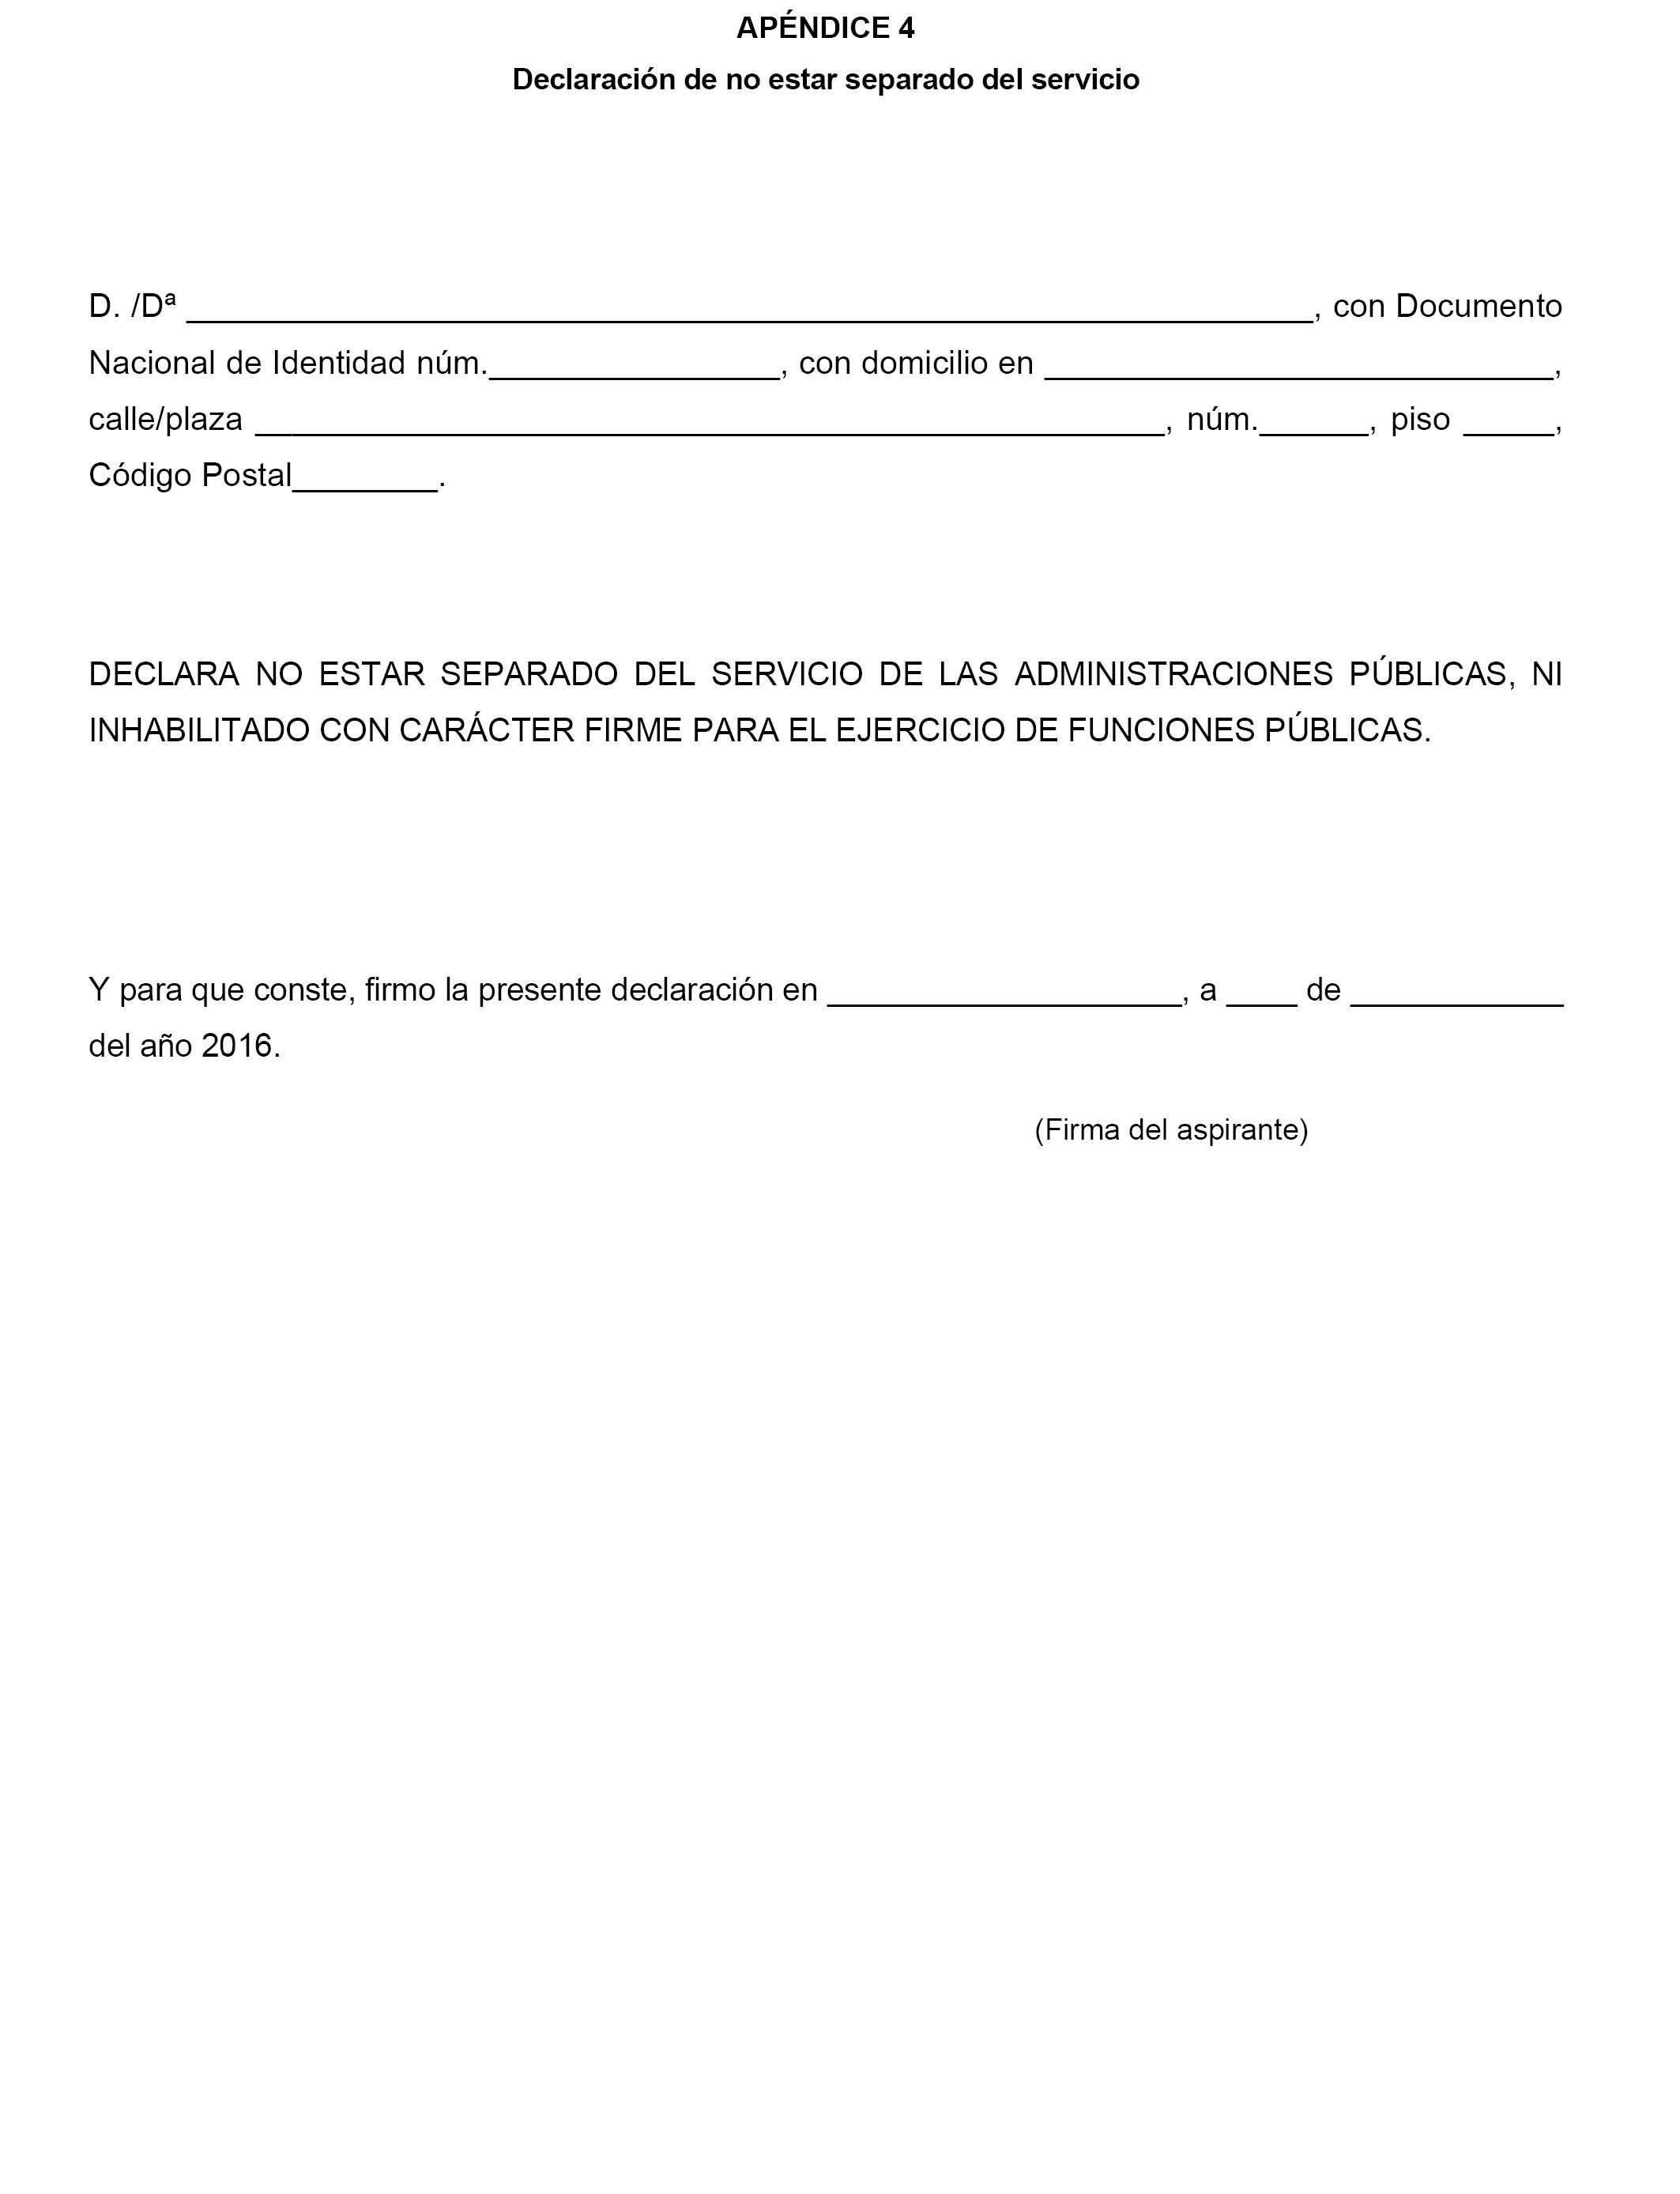 BOE.es - Documento BOE-A-2016-4872